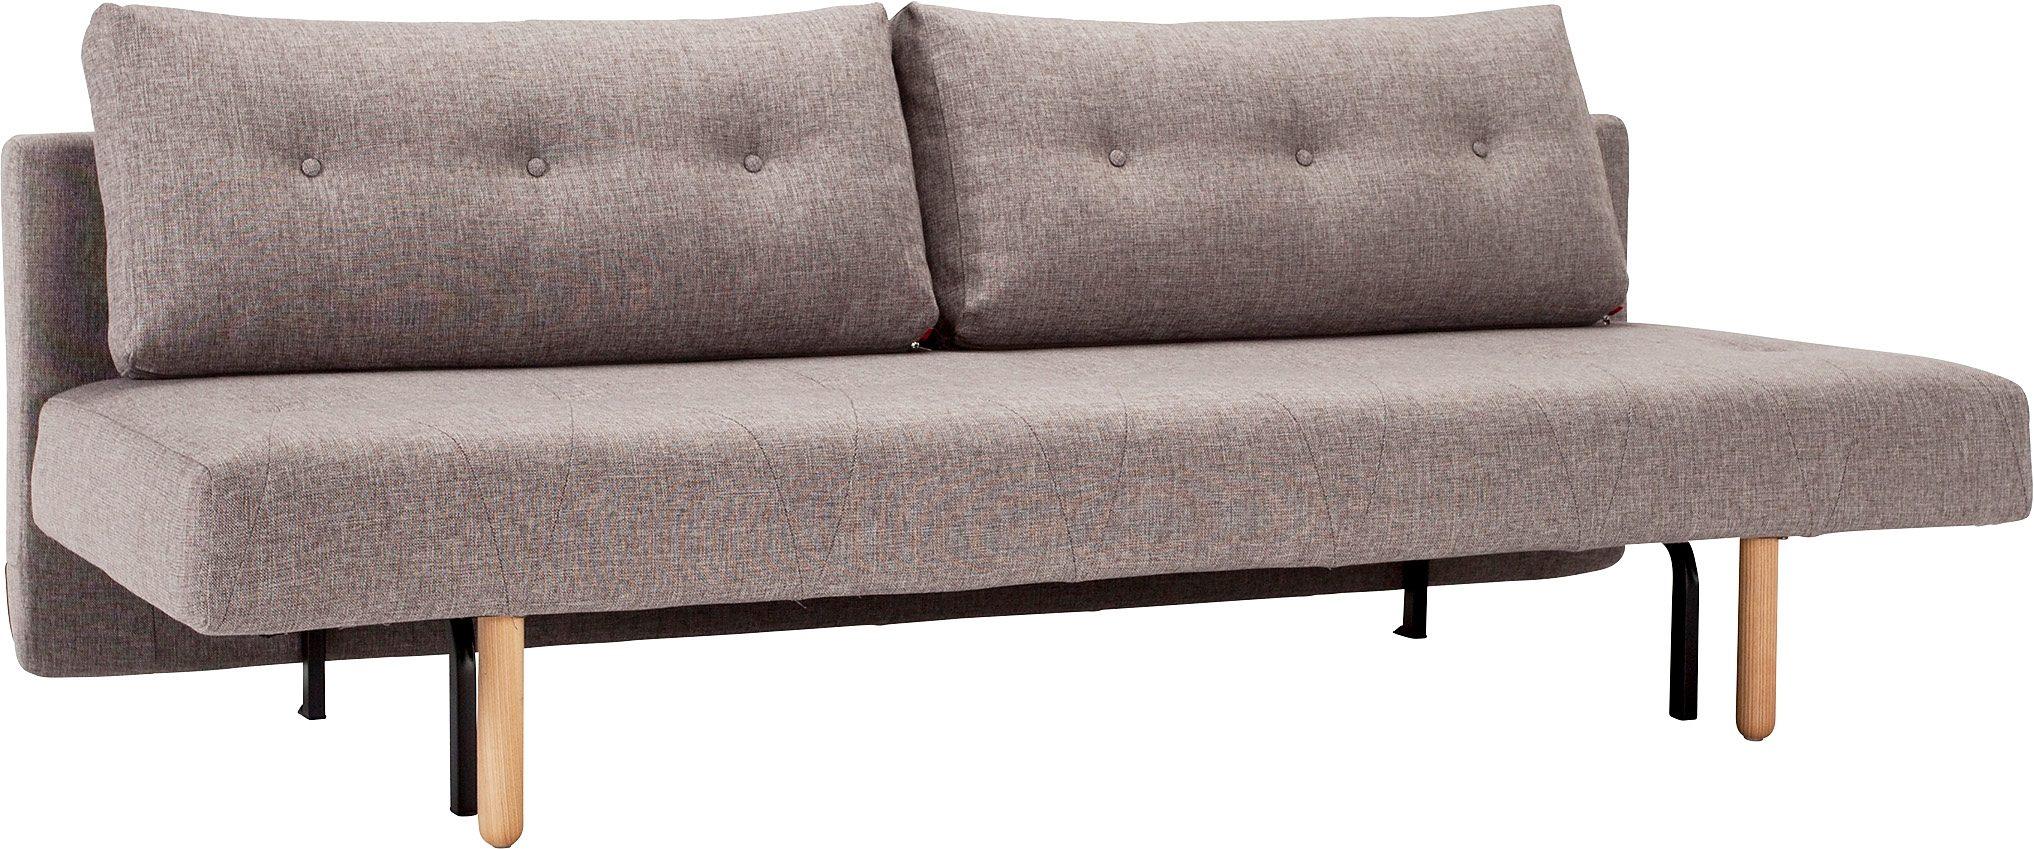 m bel aufpeppen sofa f e austauschen otto. Black Bedroom Furniture Sets. Home Design Ideas